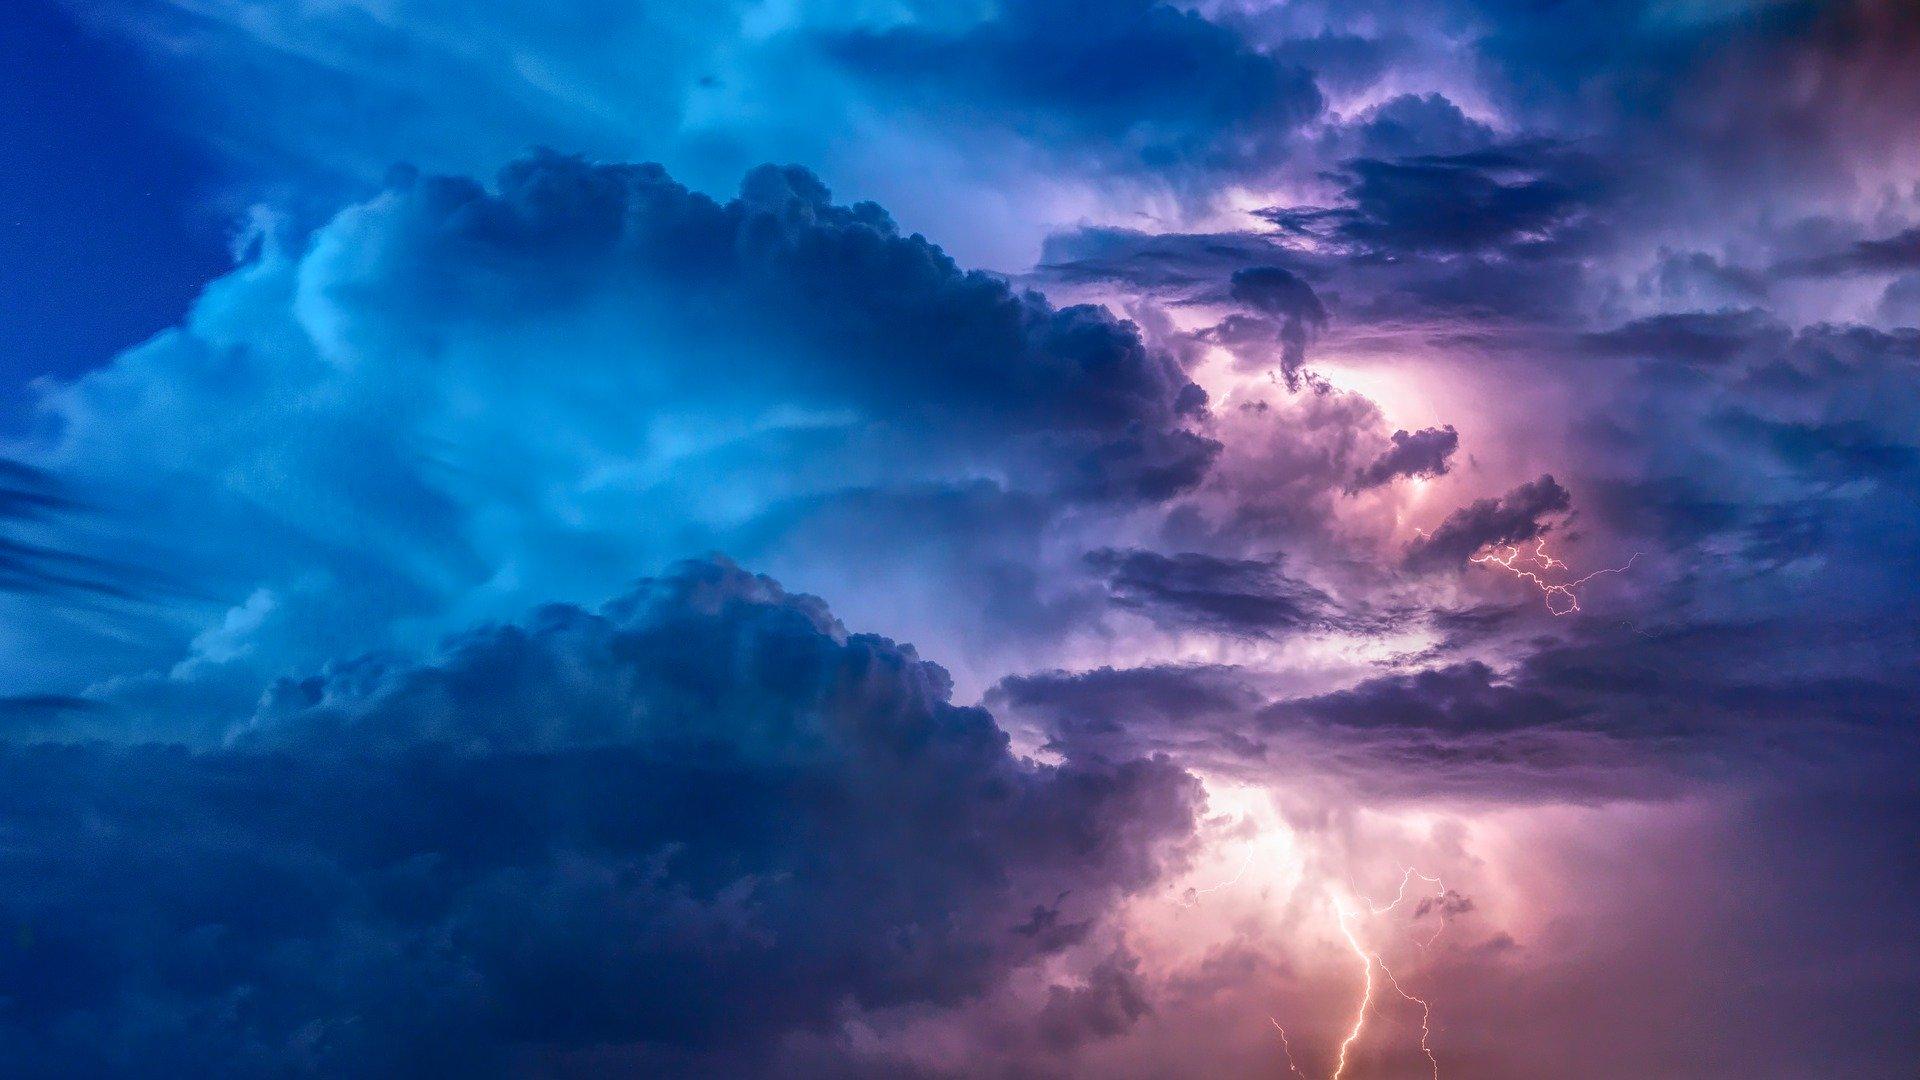 nori pe timpul unei furtuni